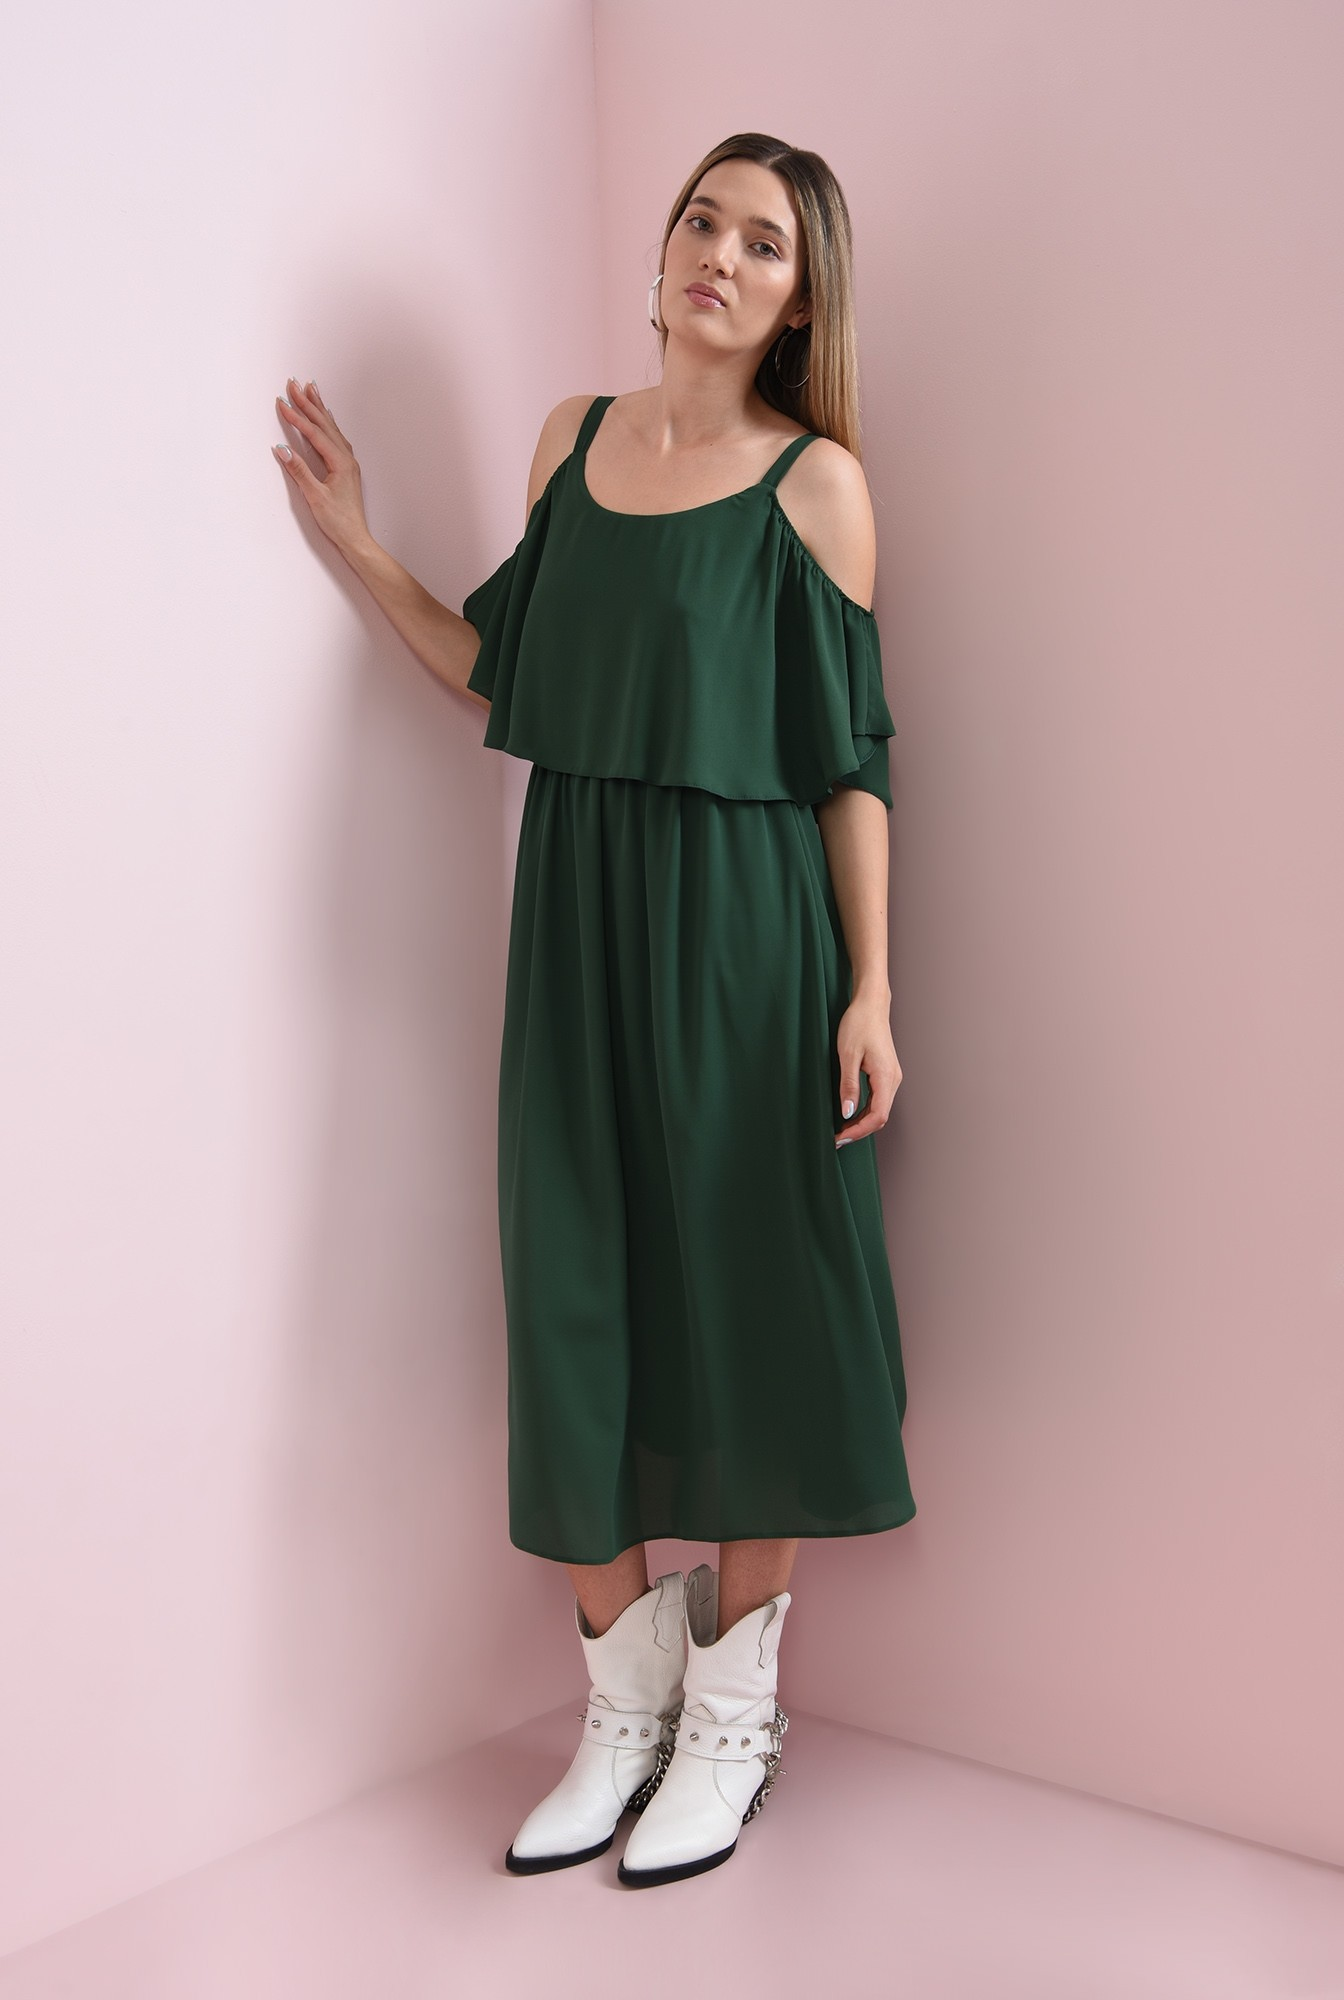 1 - rochie casual, verde, evazata